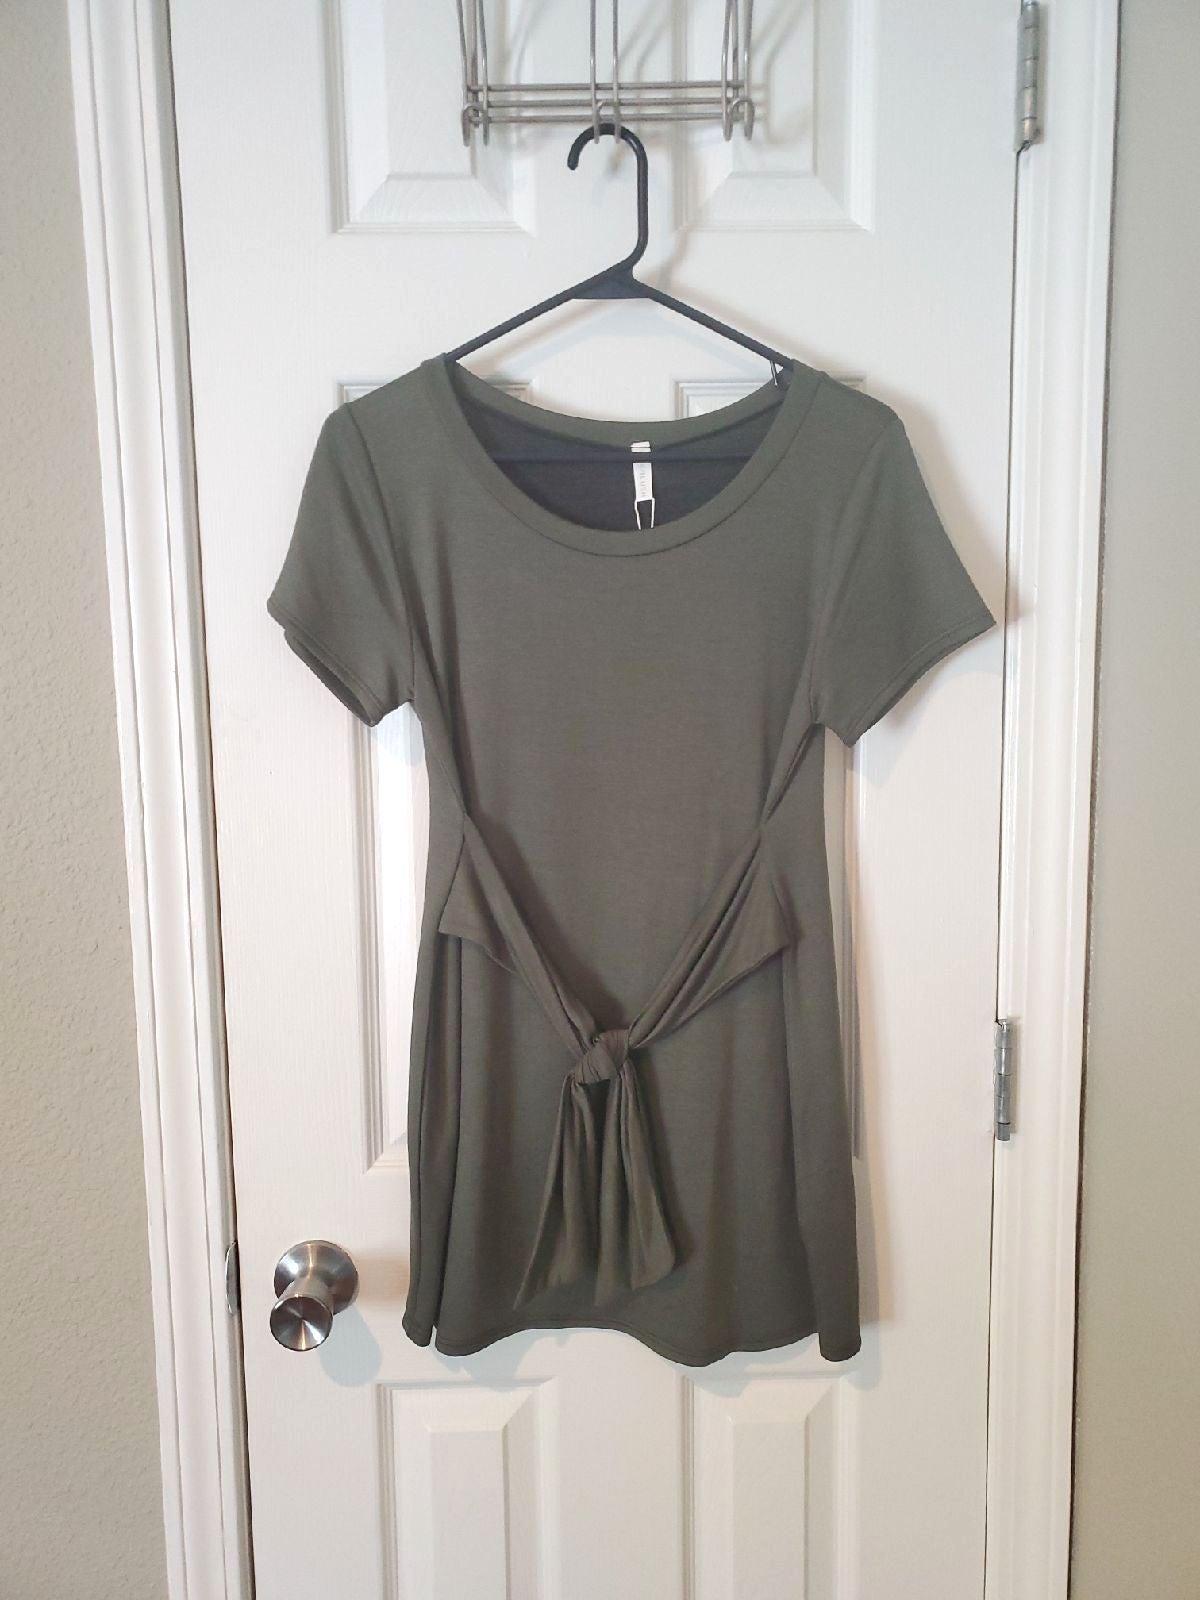 Pinkblush Small Green Short Sleeve Top